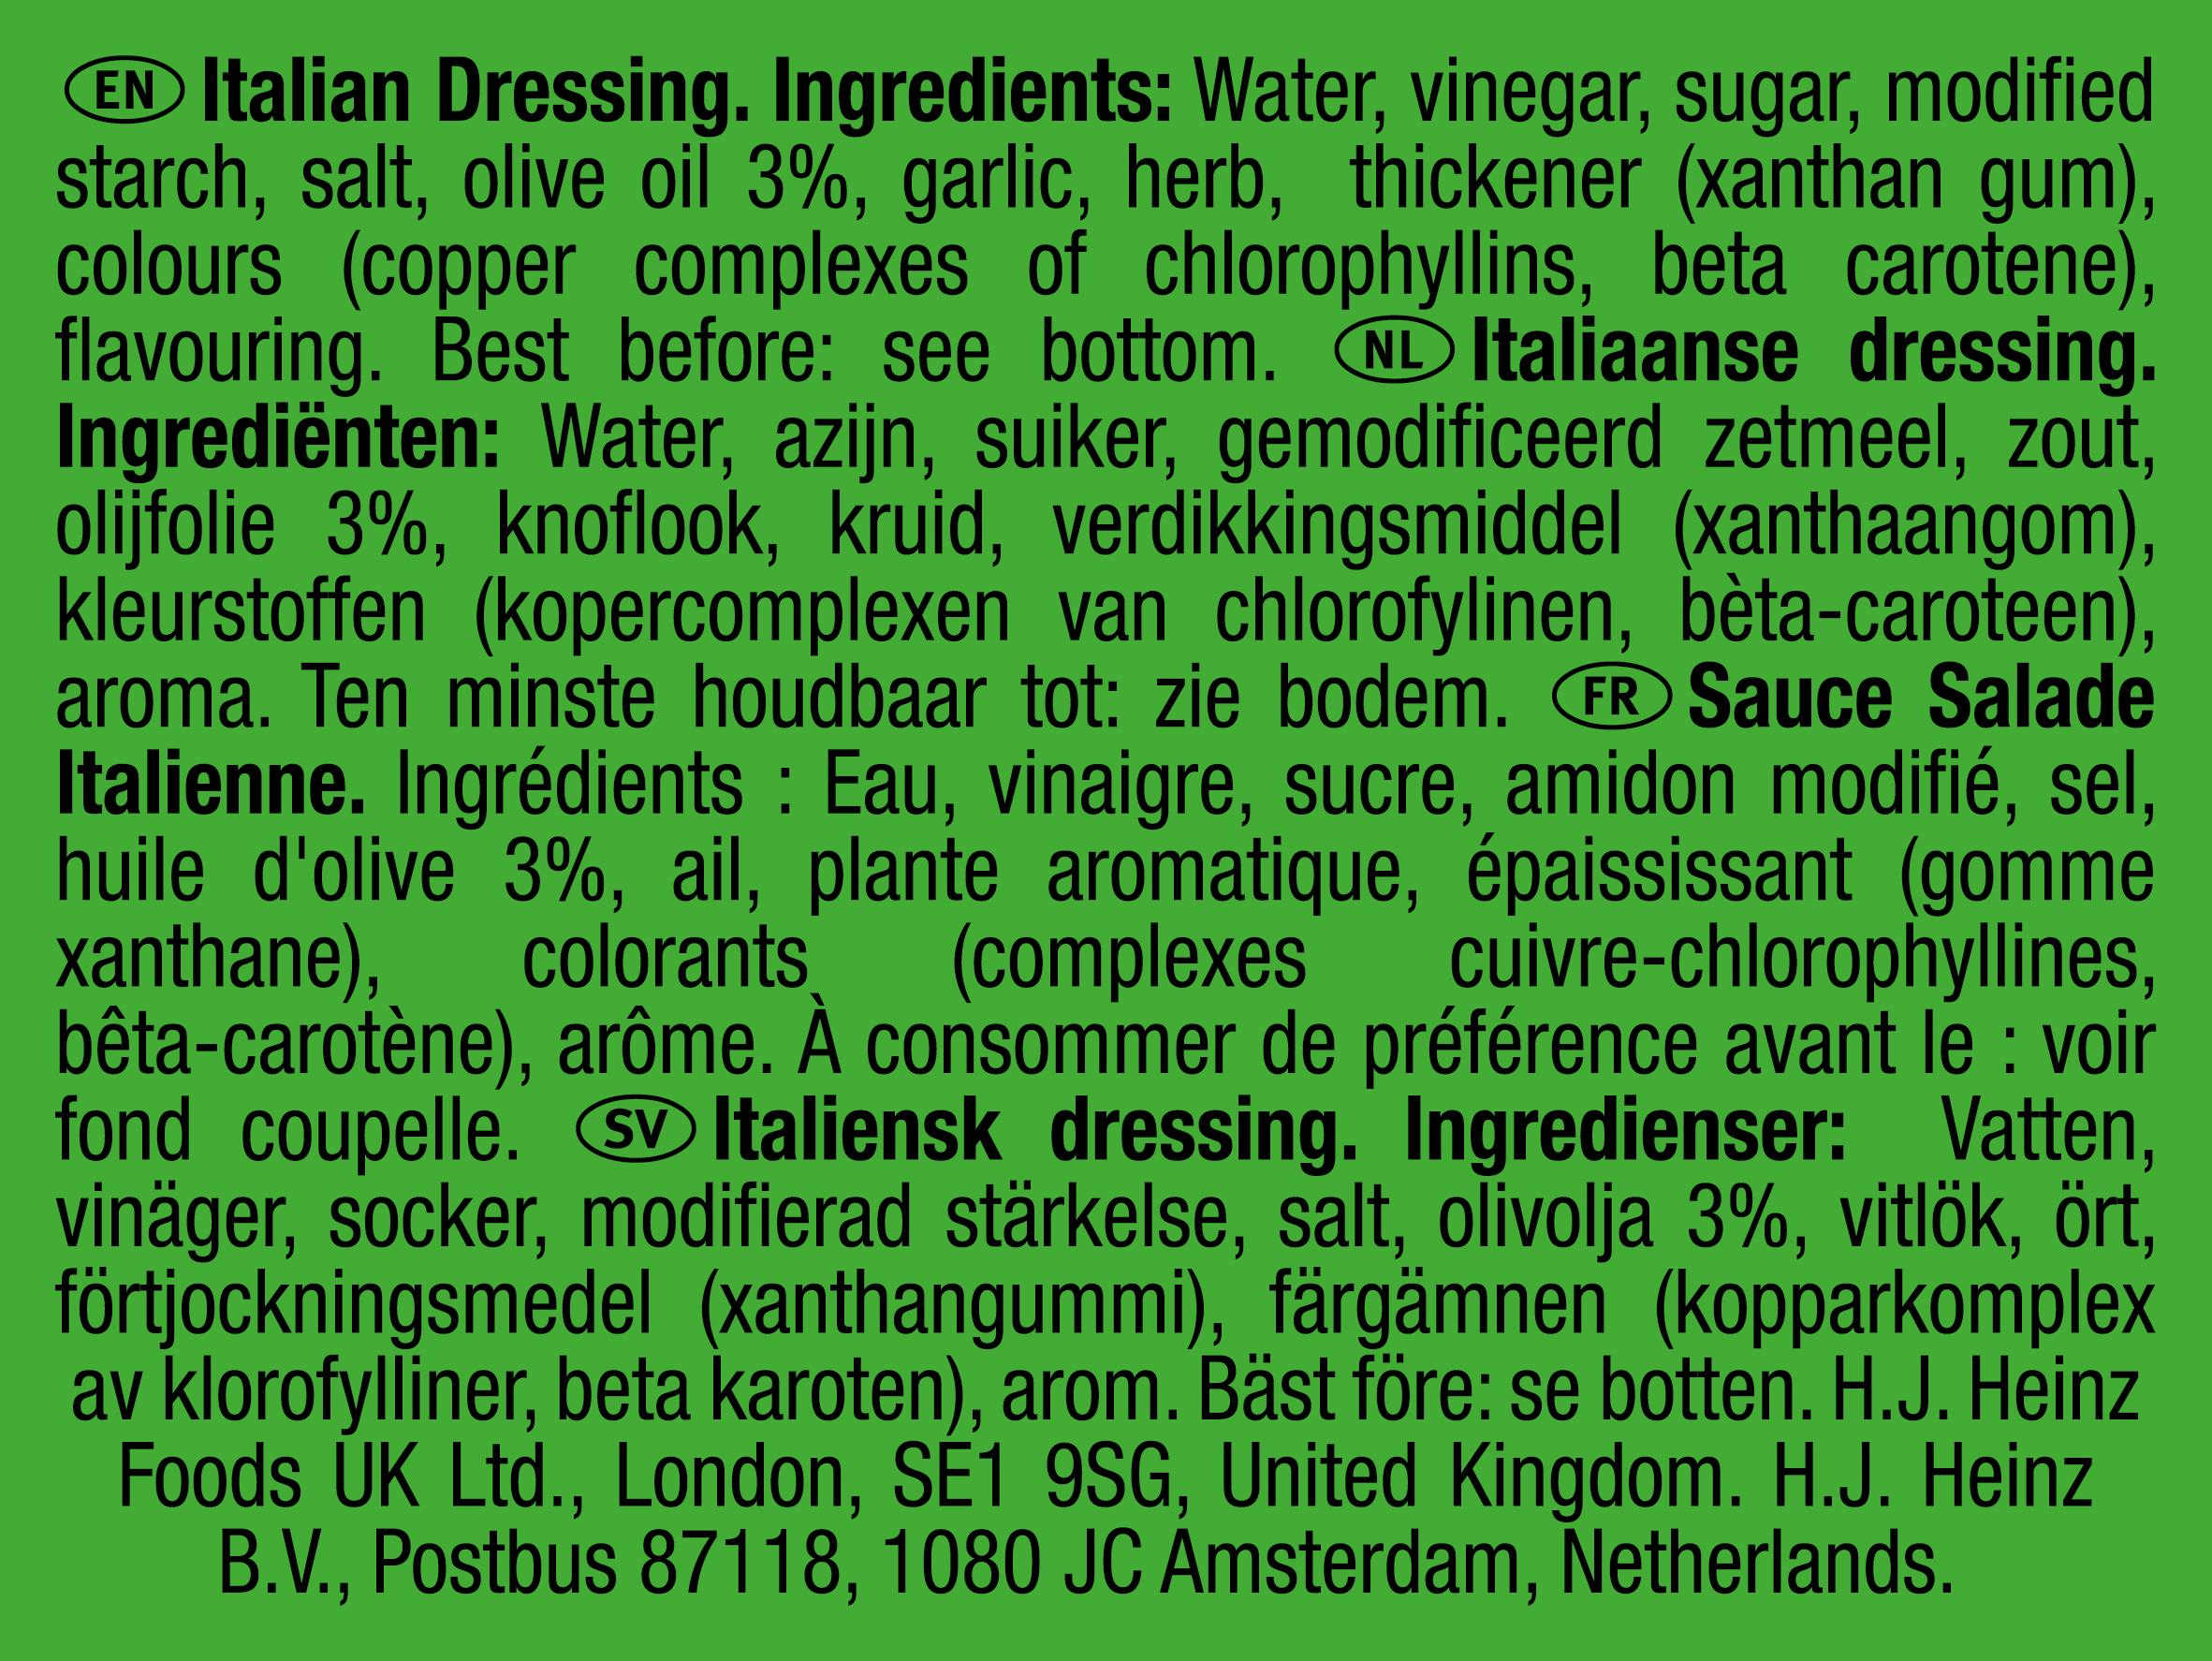 Heinz Italian Dressing 25g